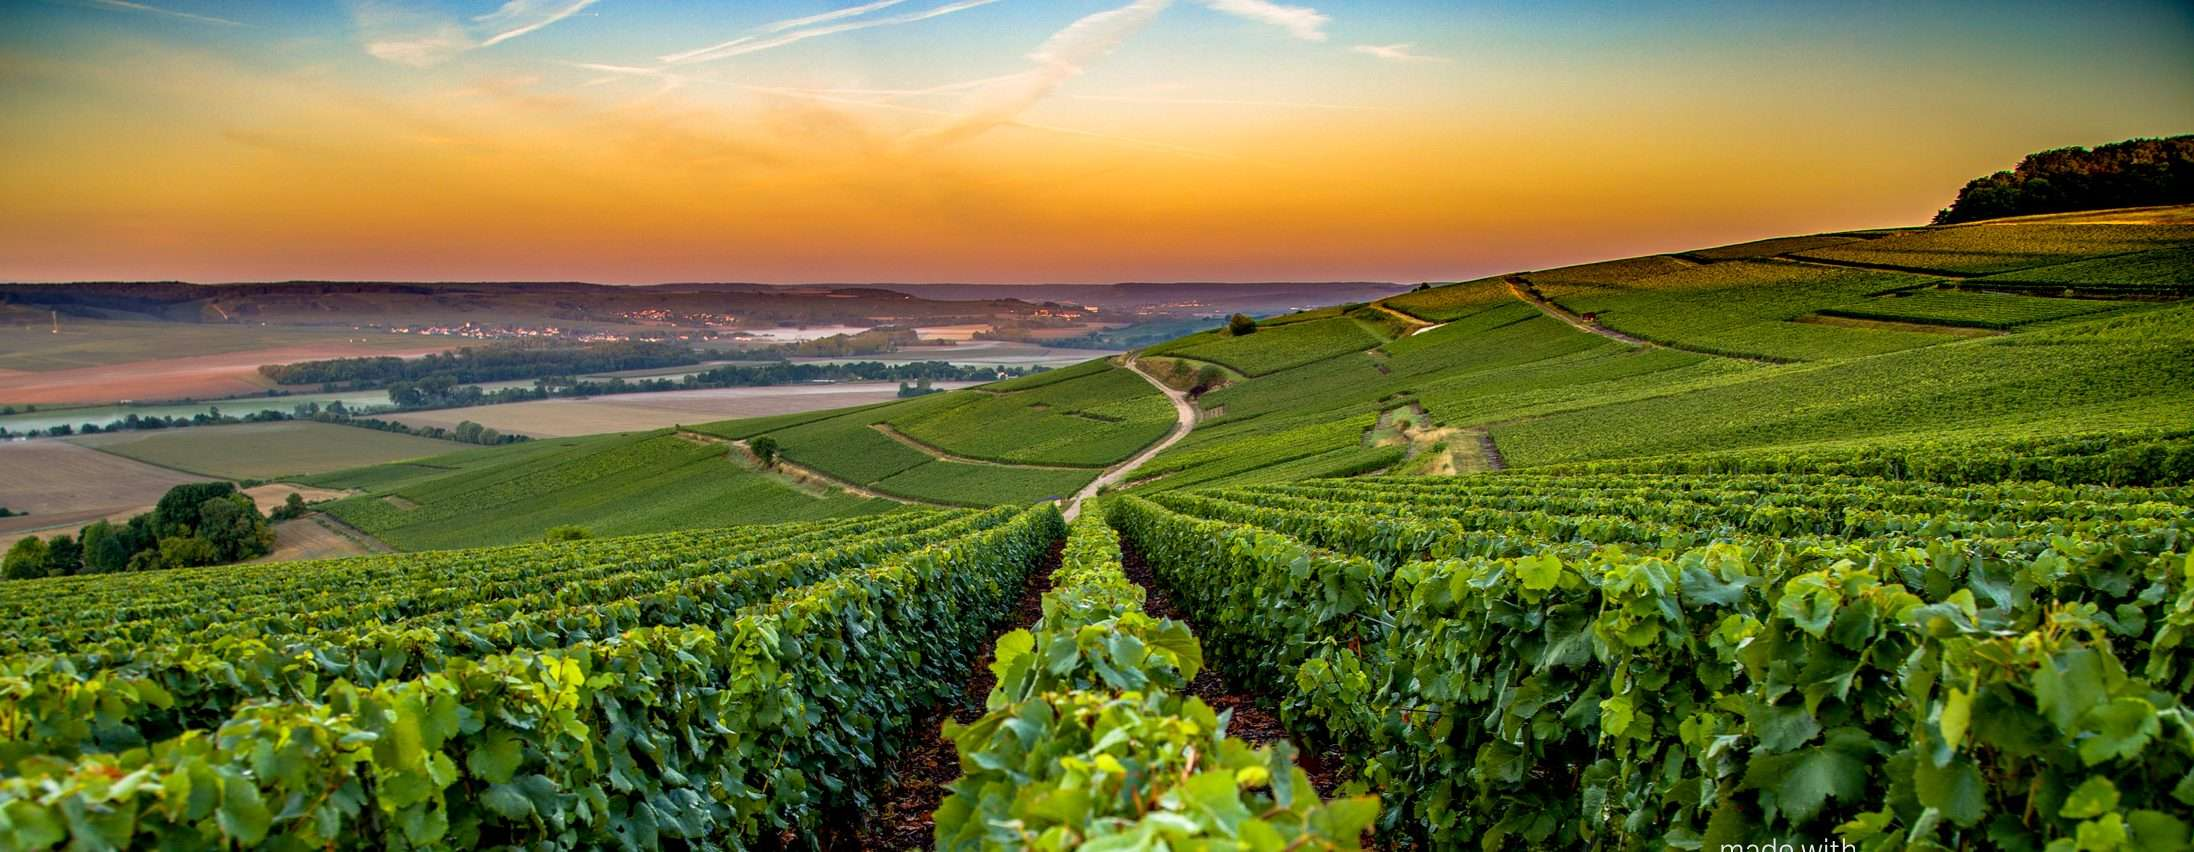 Via Francigena in France: Reims to Bar-sur-Aube